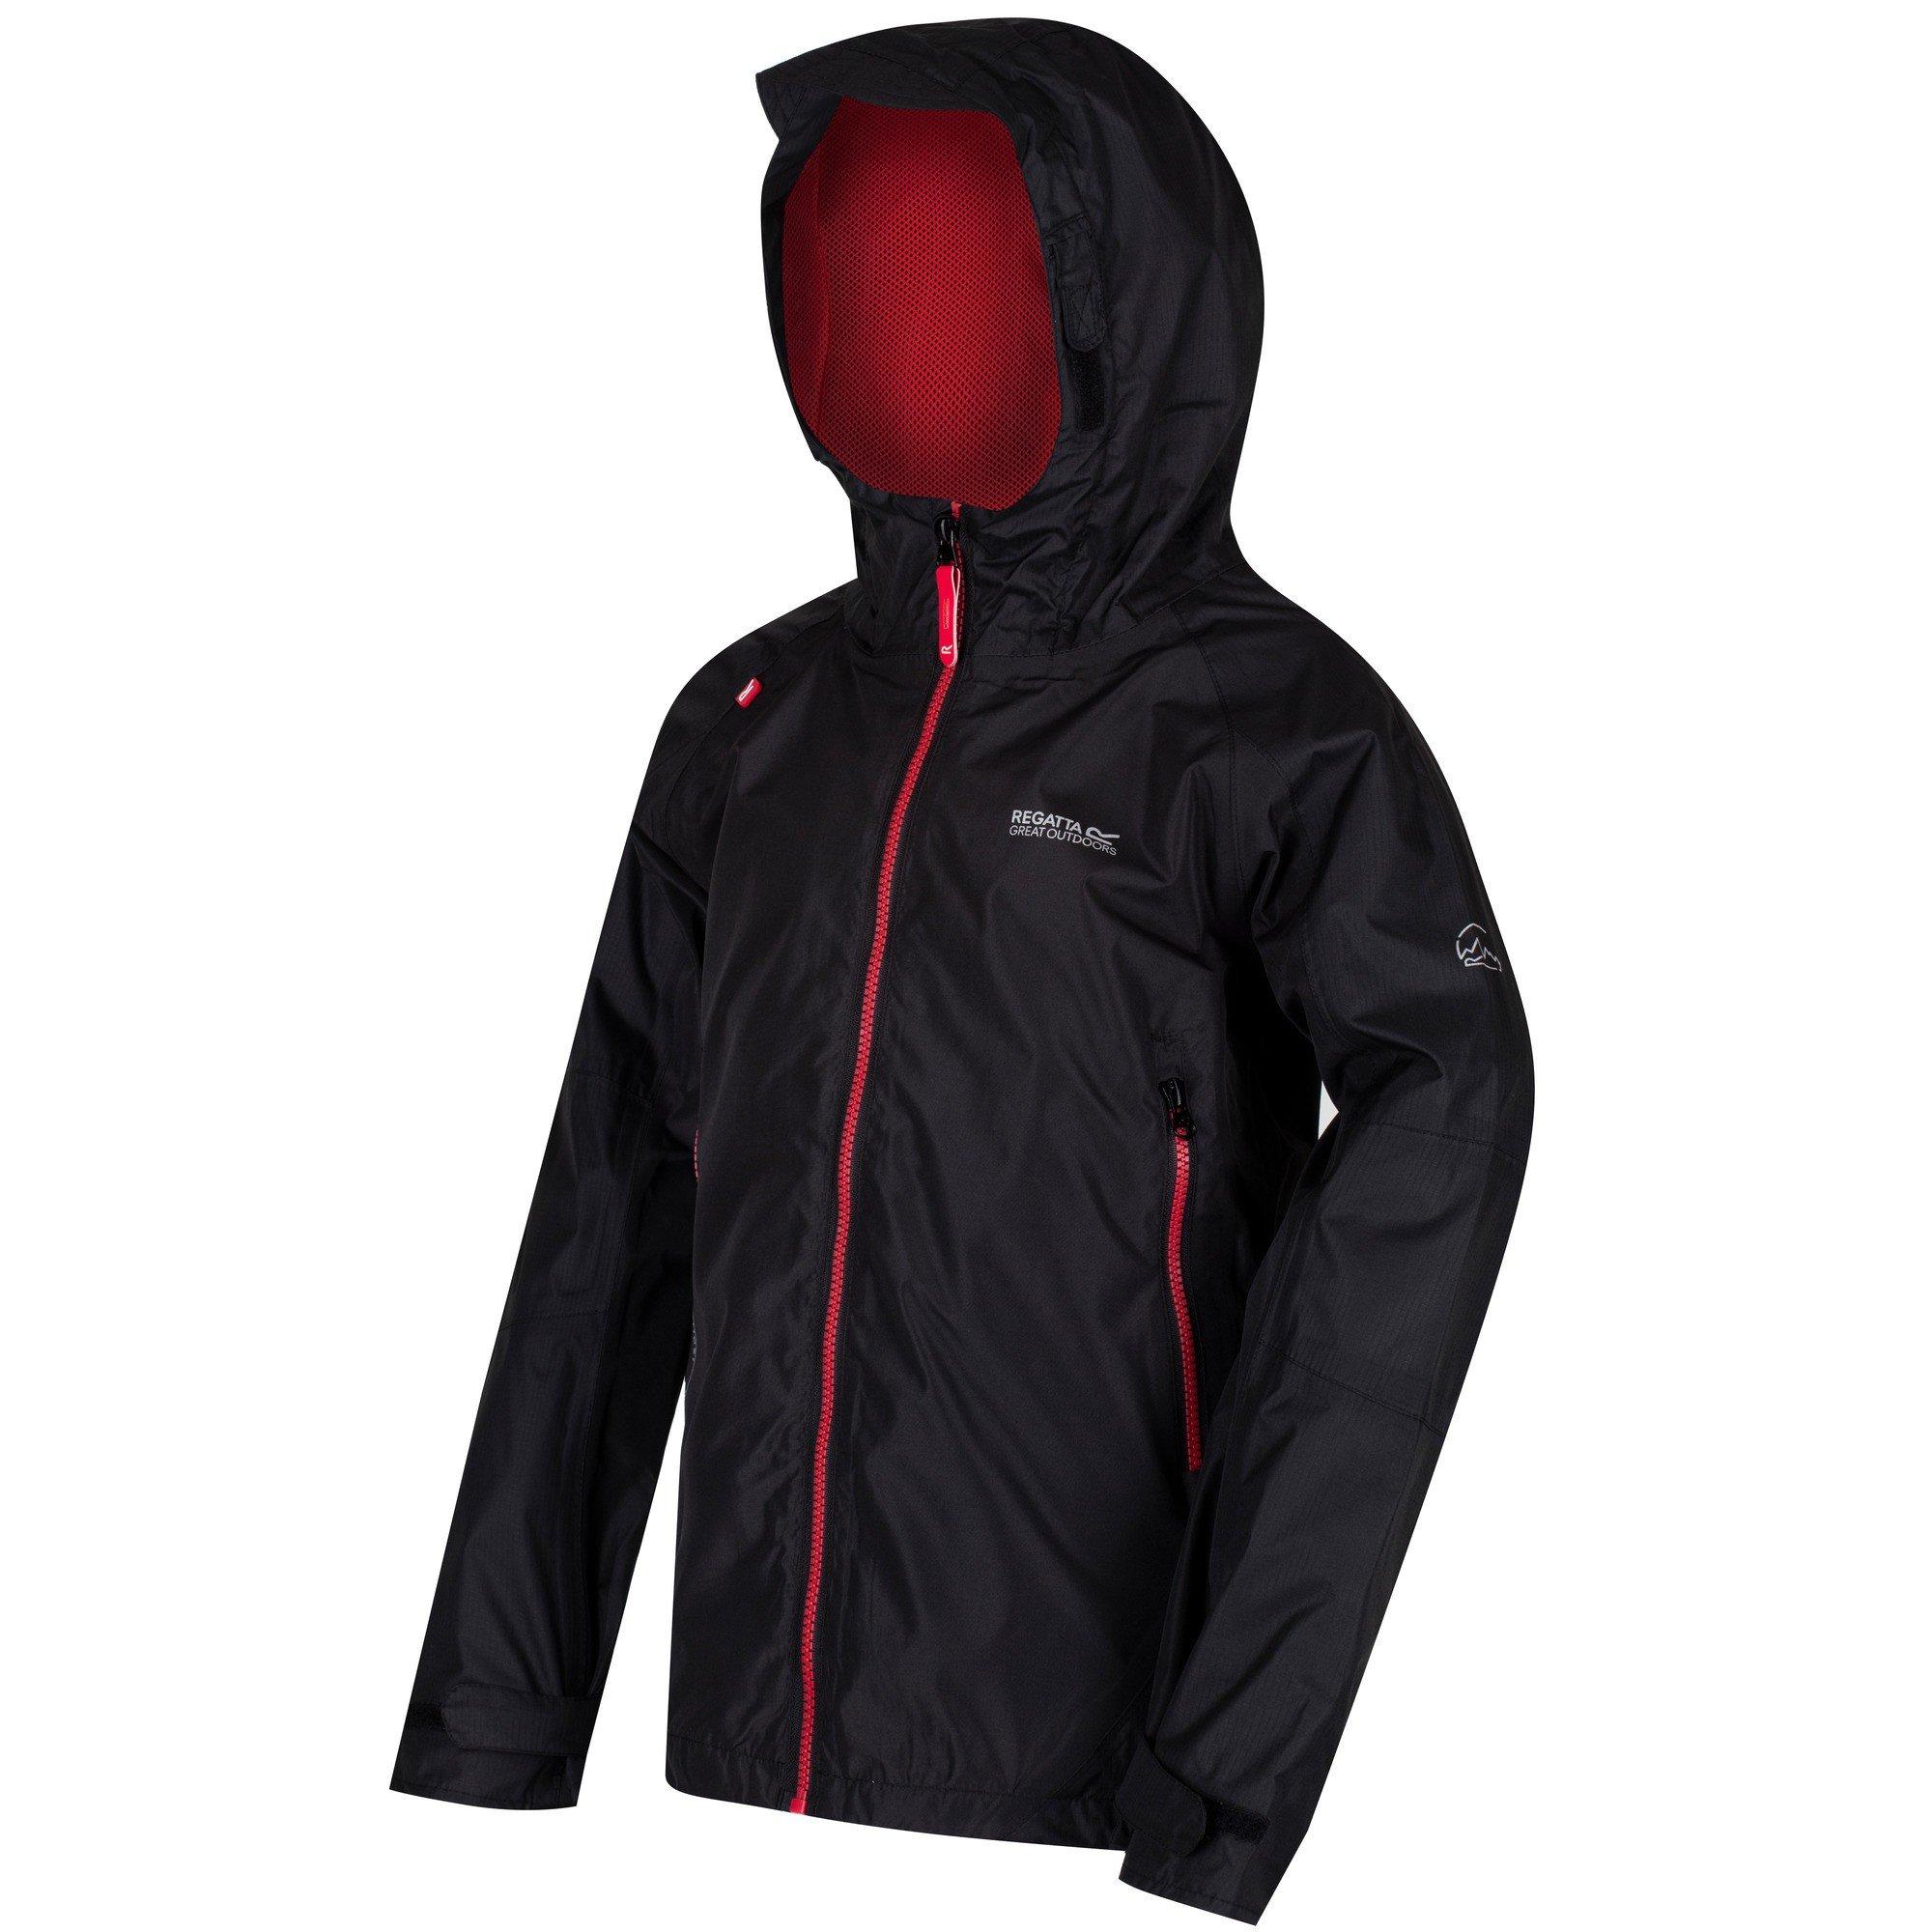 7631e8dea4bde Regatta Allcrest II Kids WP Jacket (Black/Black) - Wow Camping